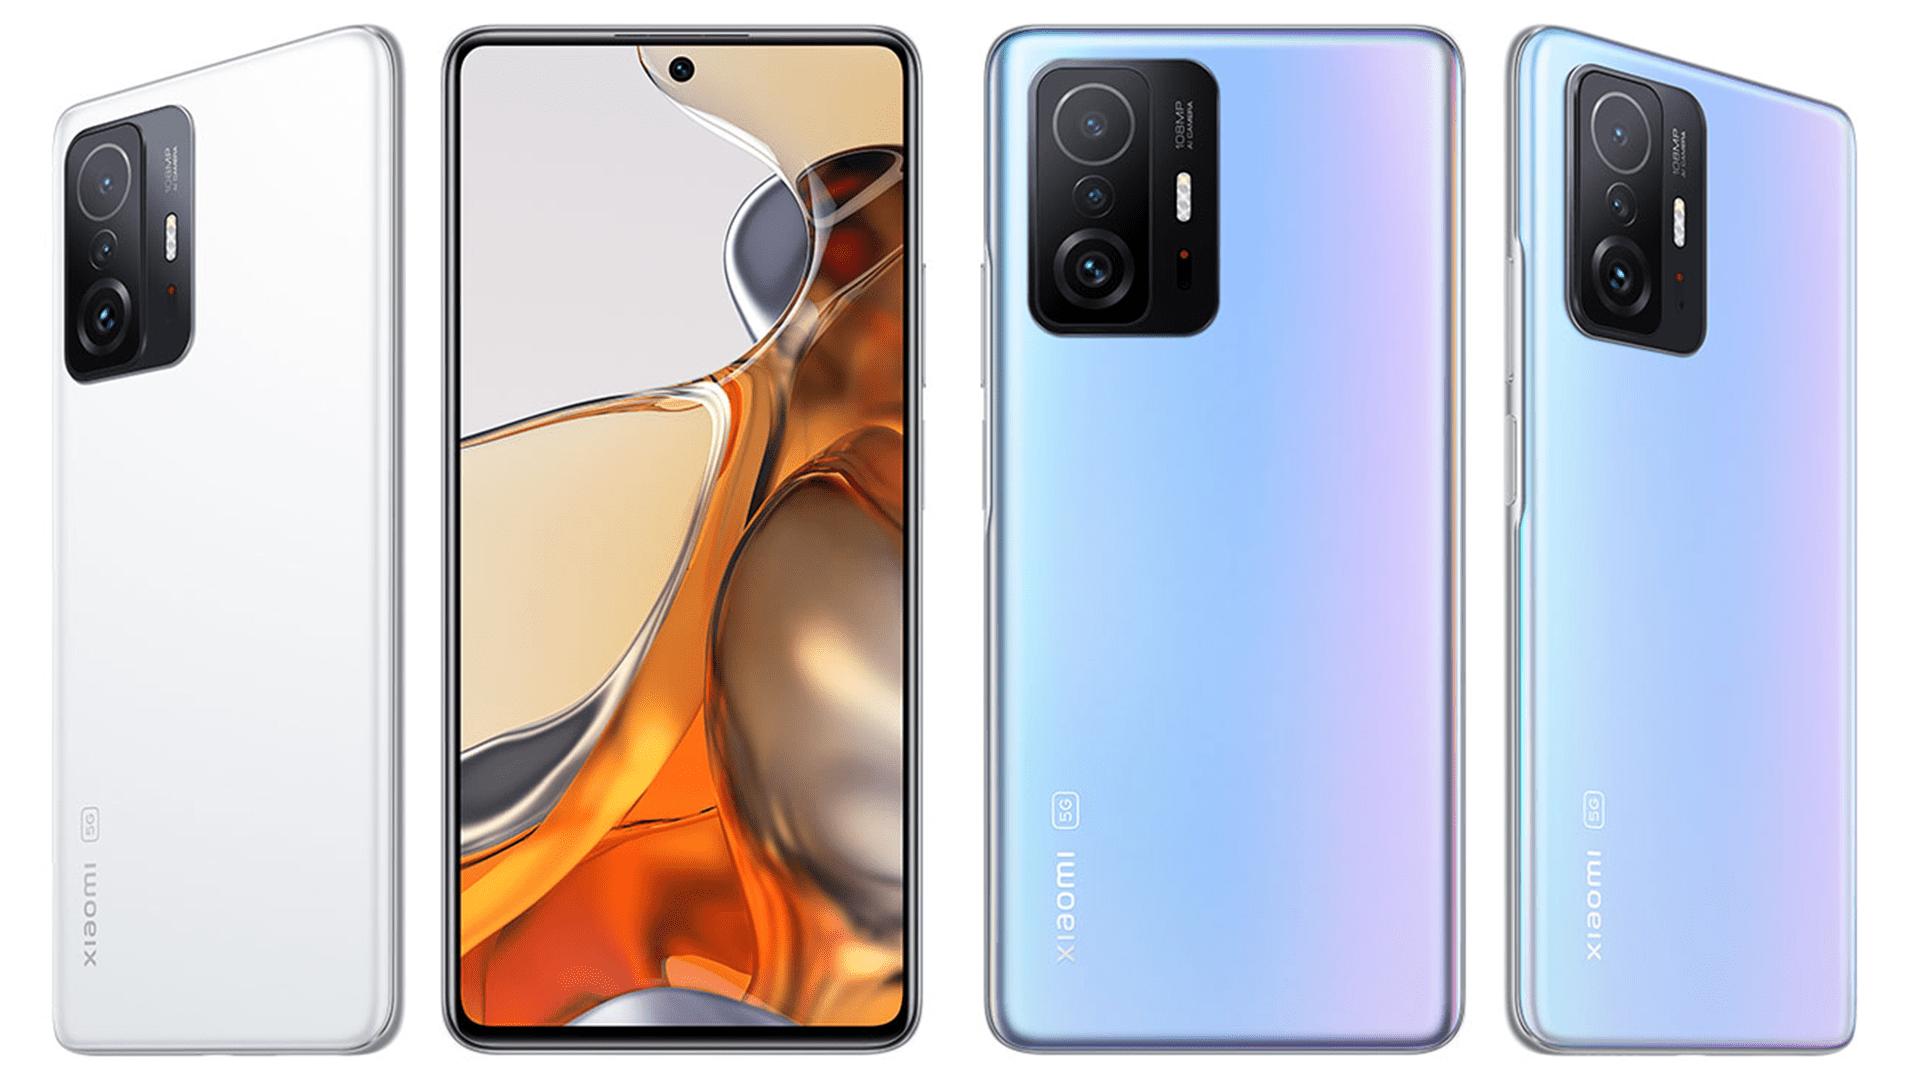 xiaomi-11T-pro-prix-smartphones-europe